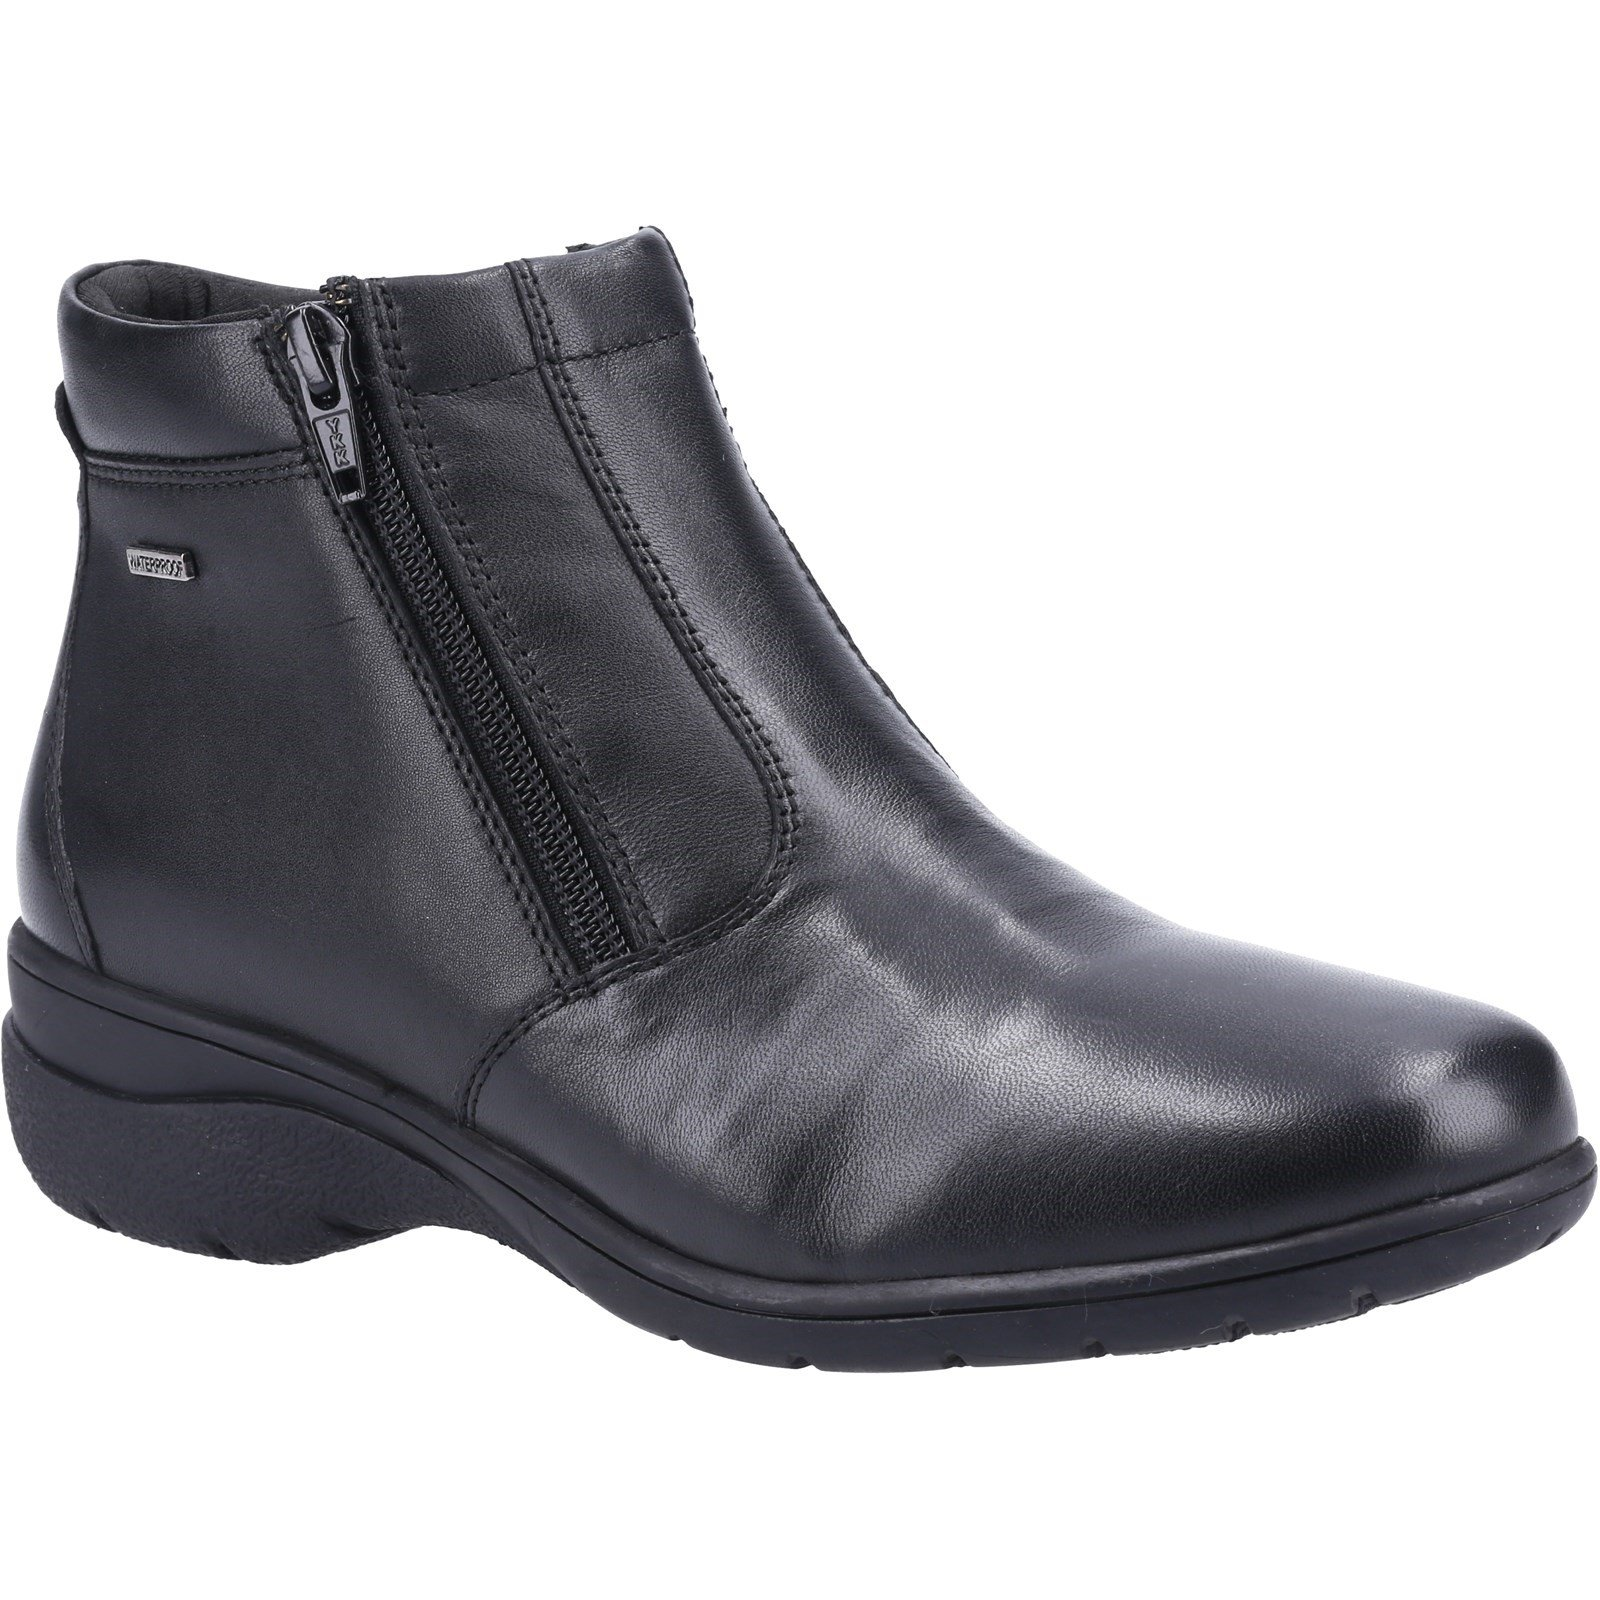 Cotswold Women's Deerhurst Waterproof Boot Black - Black 8